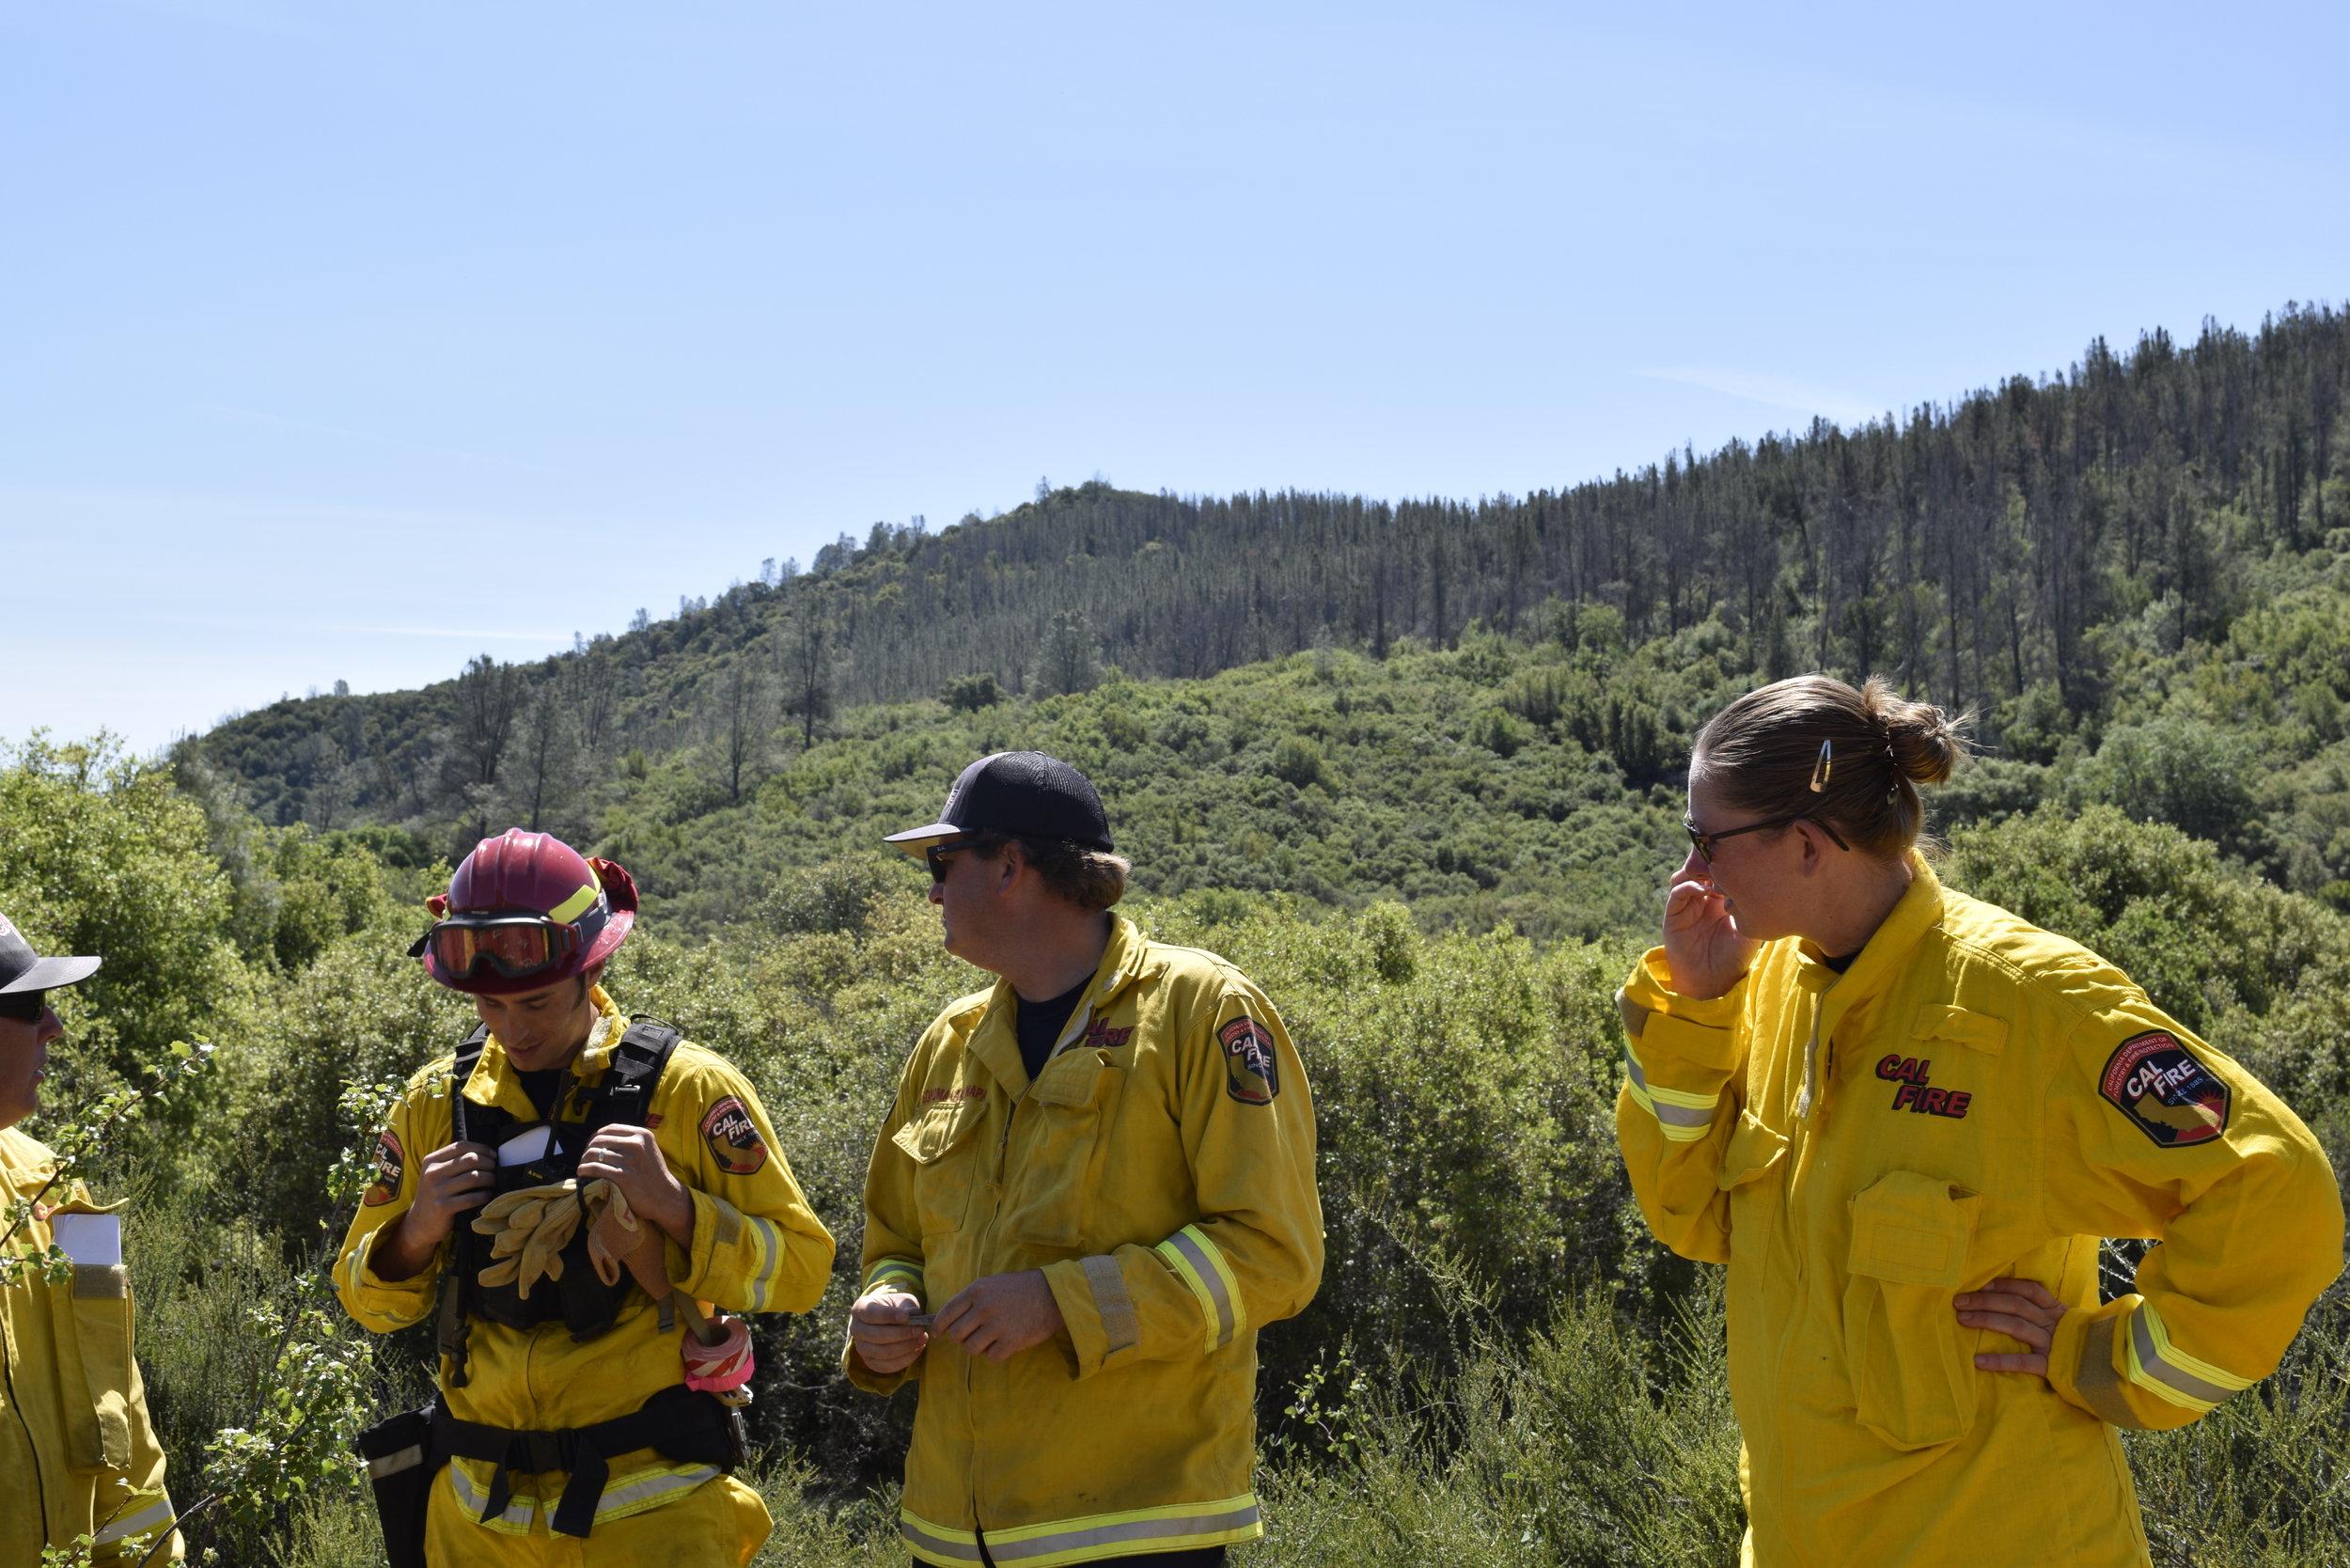 Cal Fire - Sonoma-Lake-Napa Unit